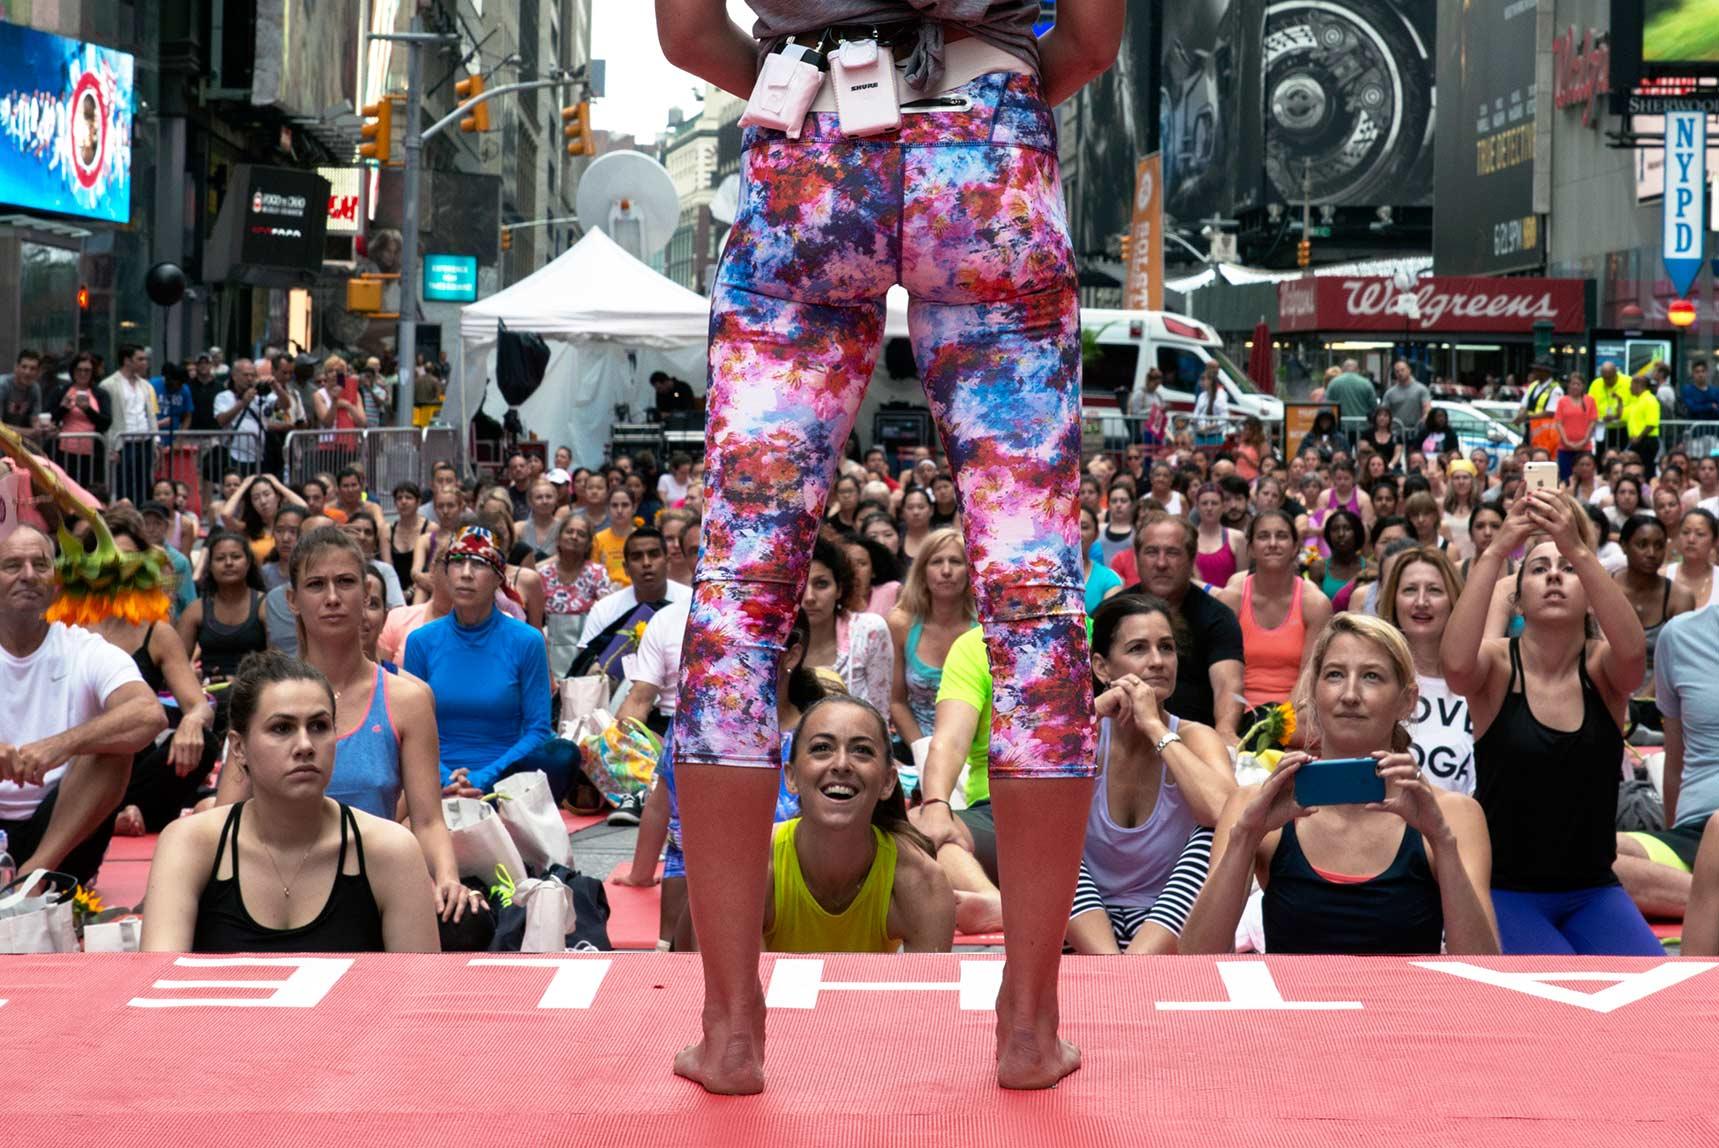 10 yoga new york city times square.jpg